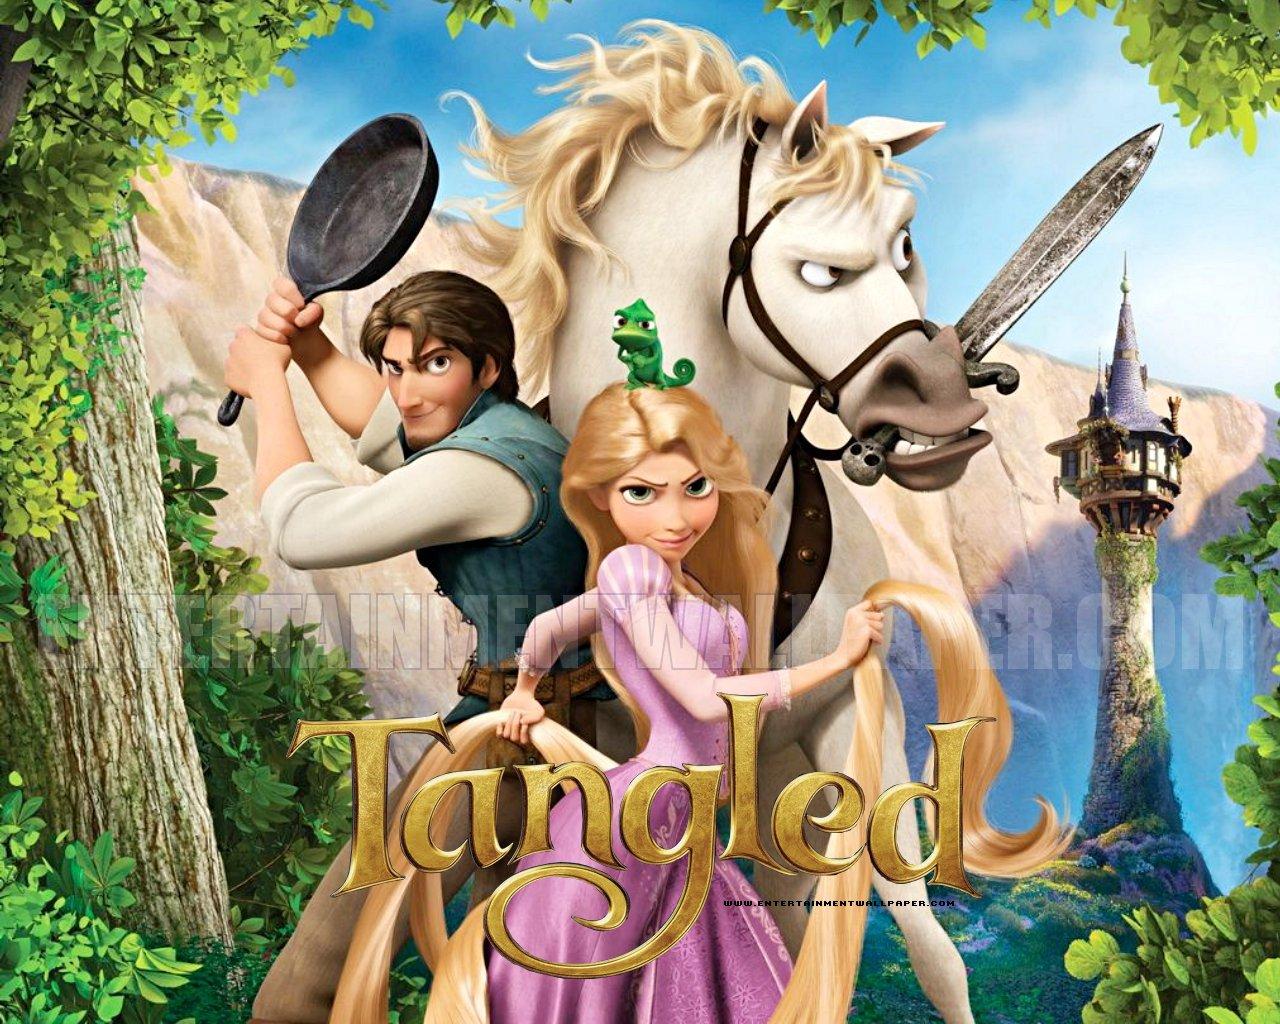 tangled tangled tangled 1280x1024